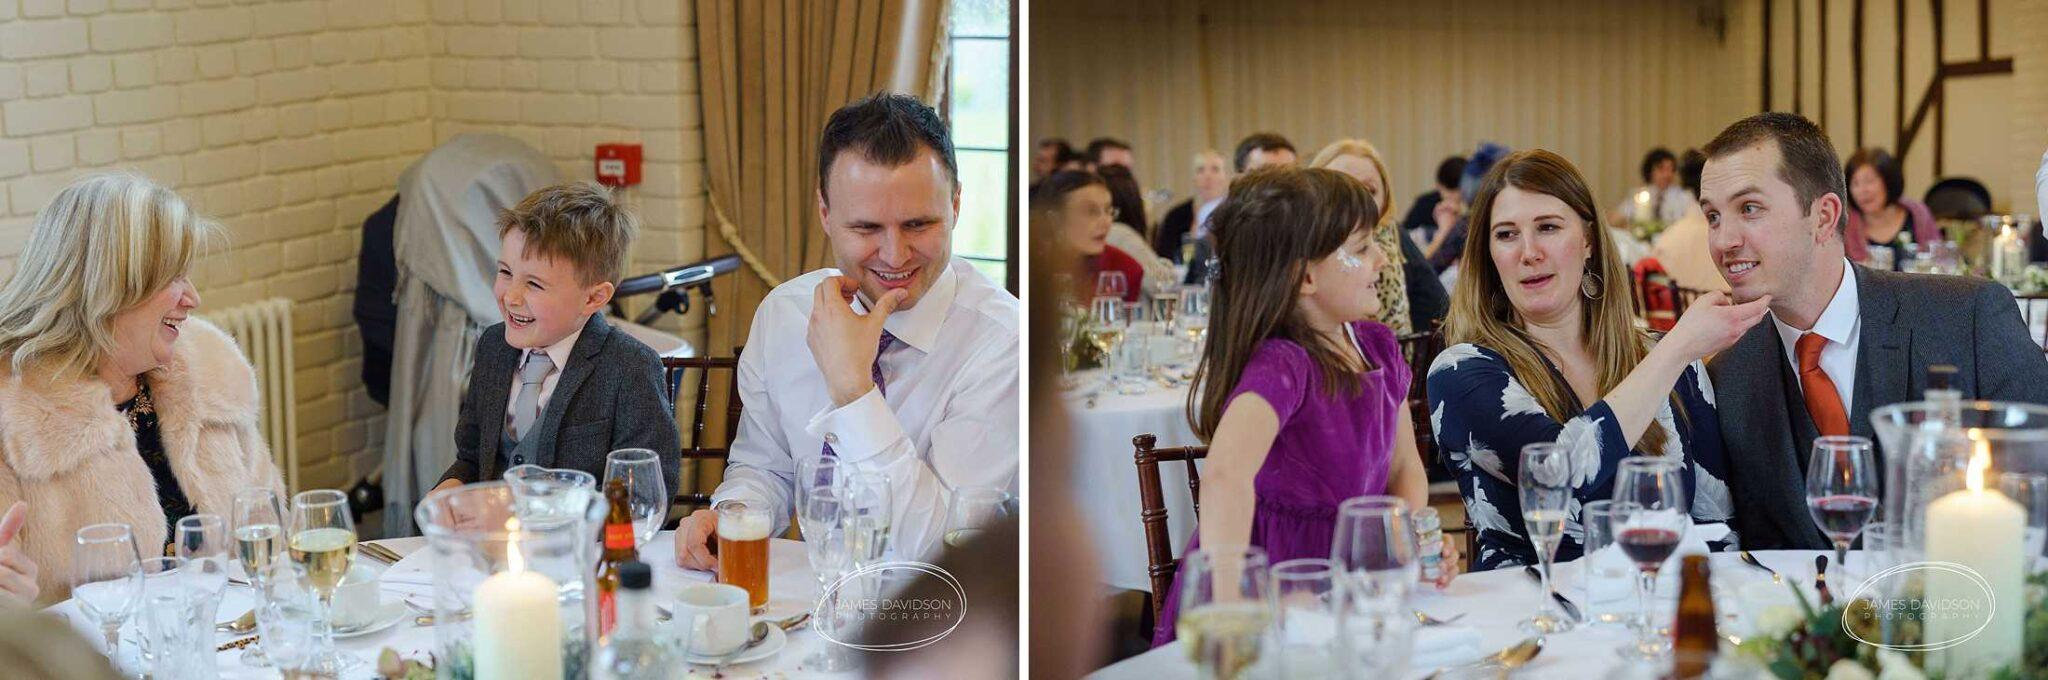 seckford-hall-wedding-077